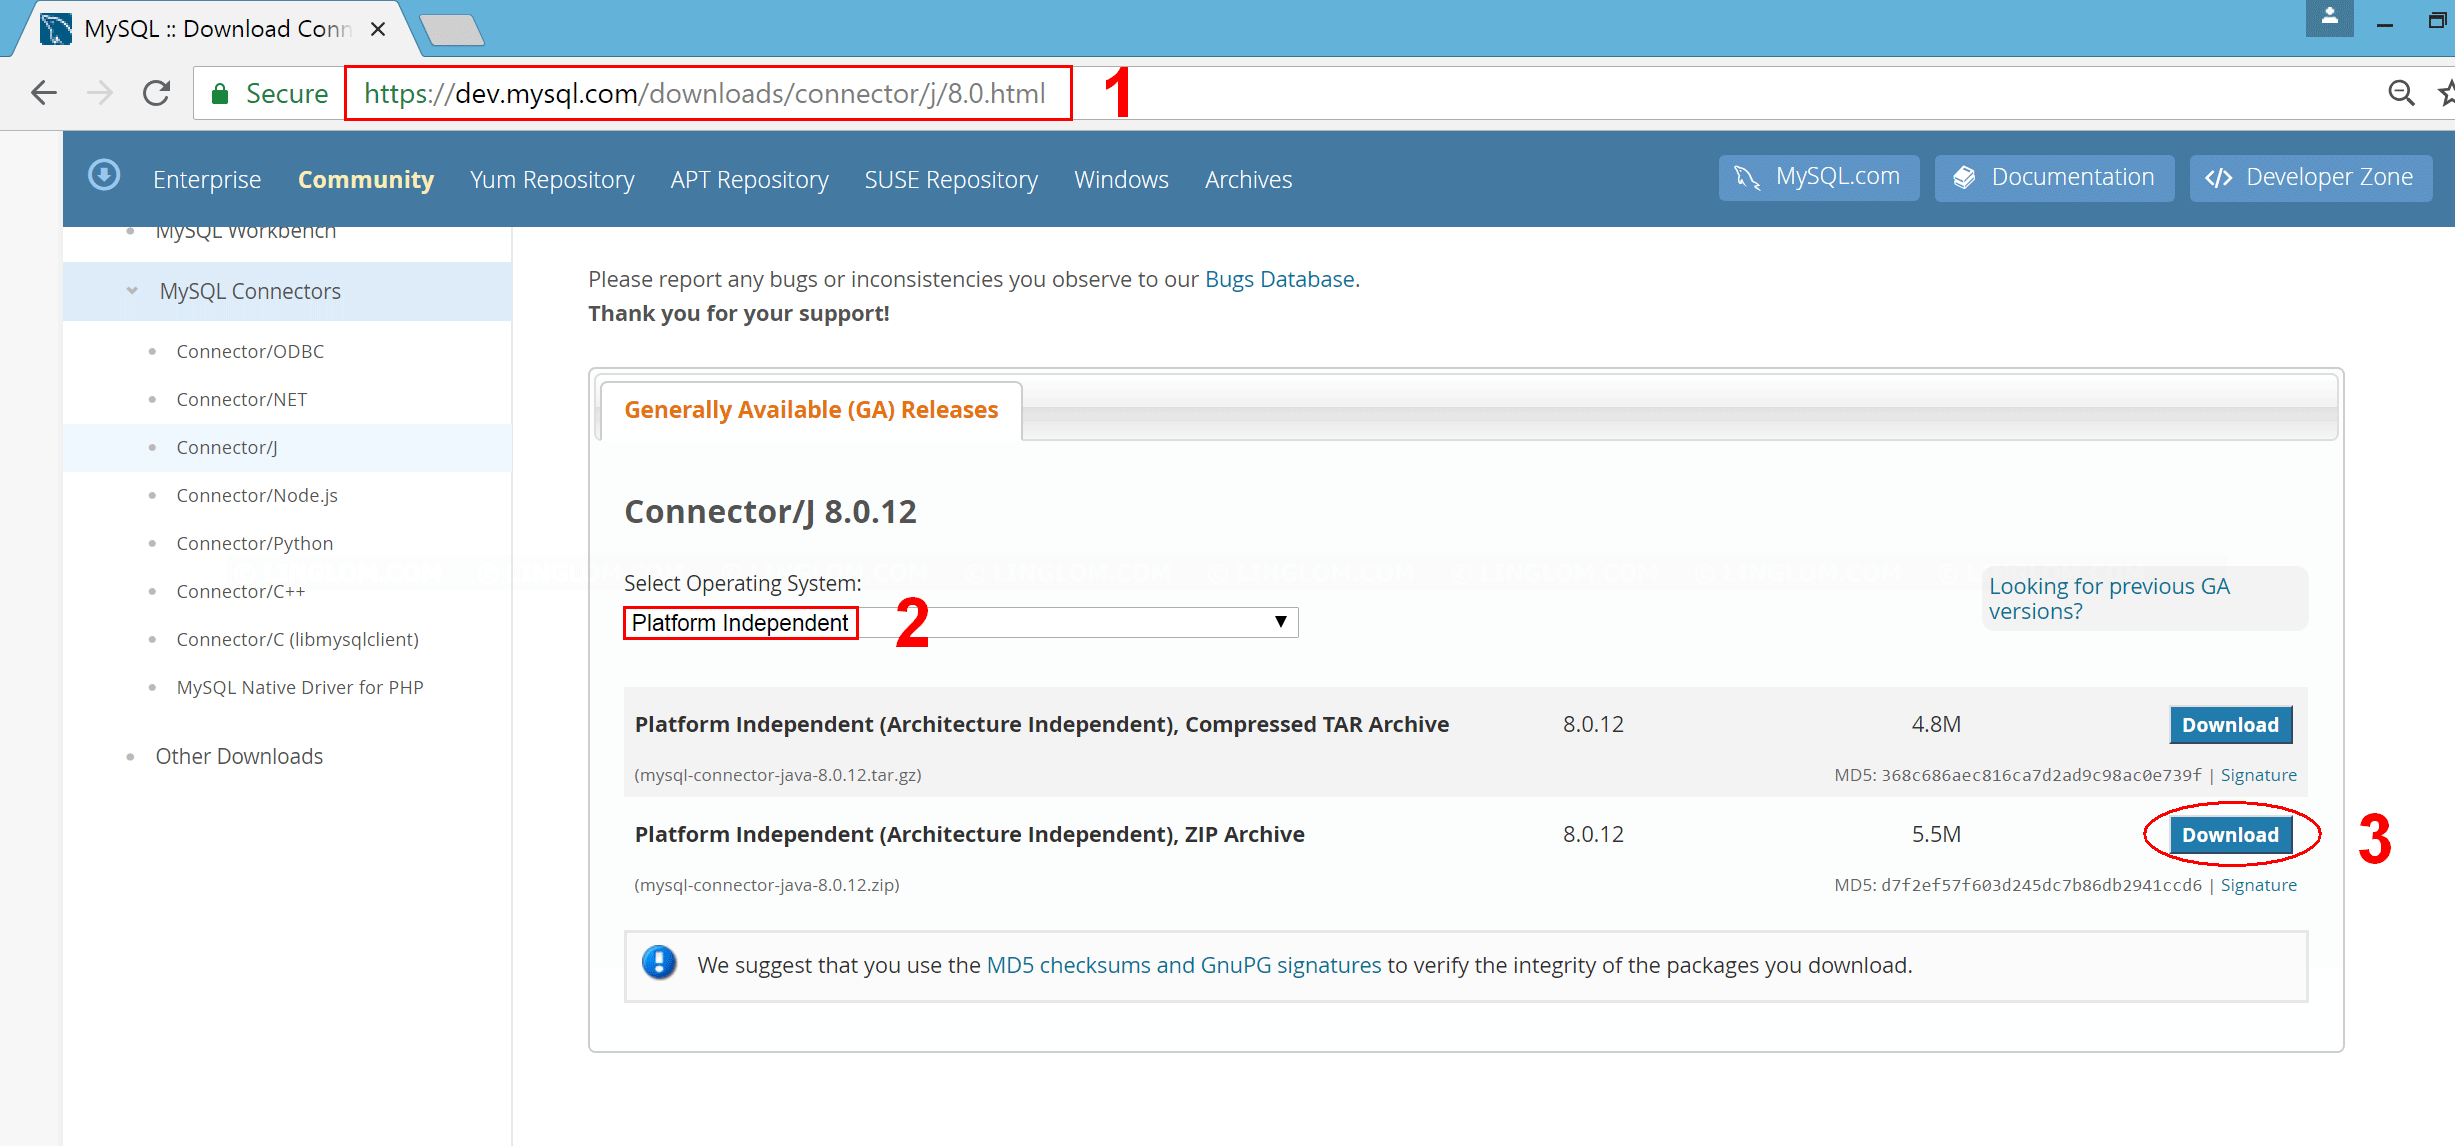 Accessing MariaDB on NetBeans 8 2 using JDBC, Part 2: Create